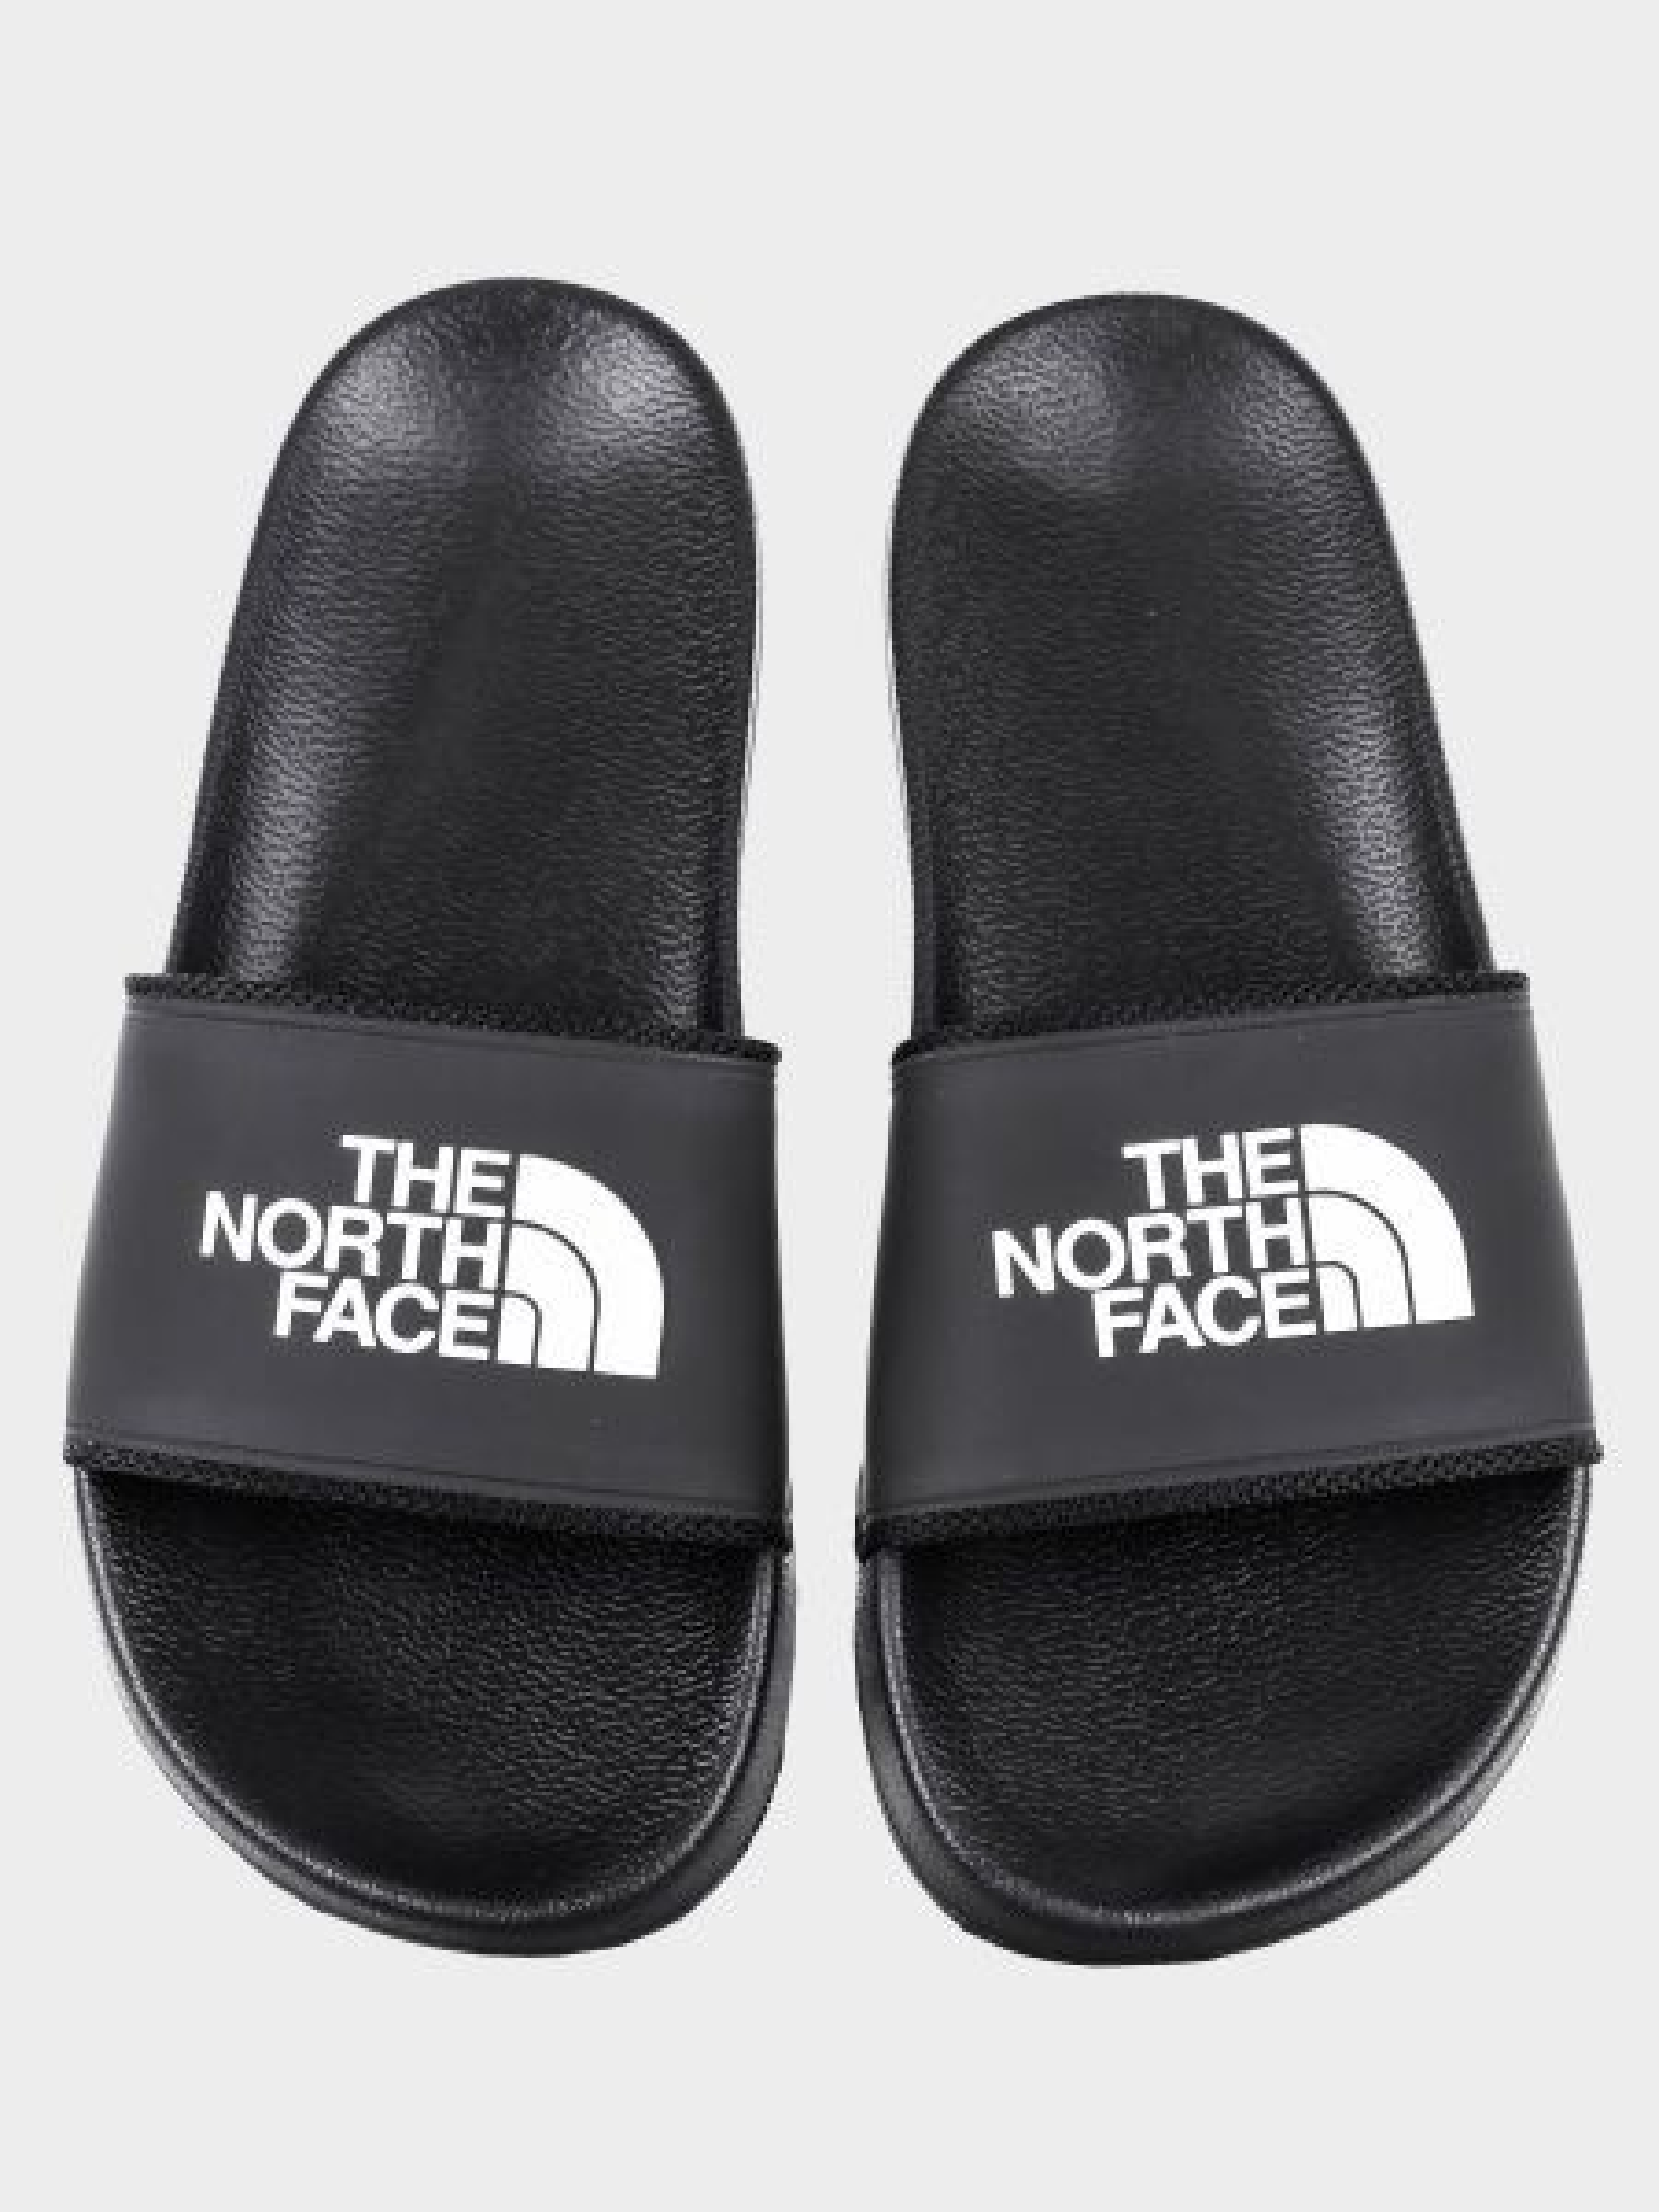 Шлёпанцы для женщин The North Face Base Camp Slide II NF0A3K4BKY41 бесплатная доставка, 2017